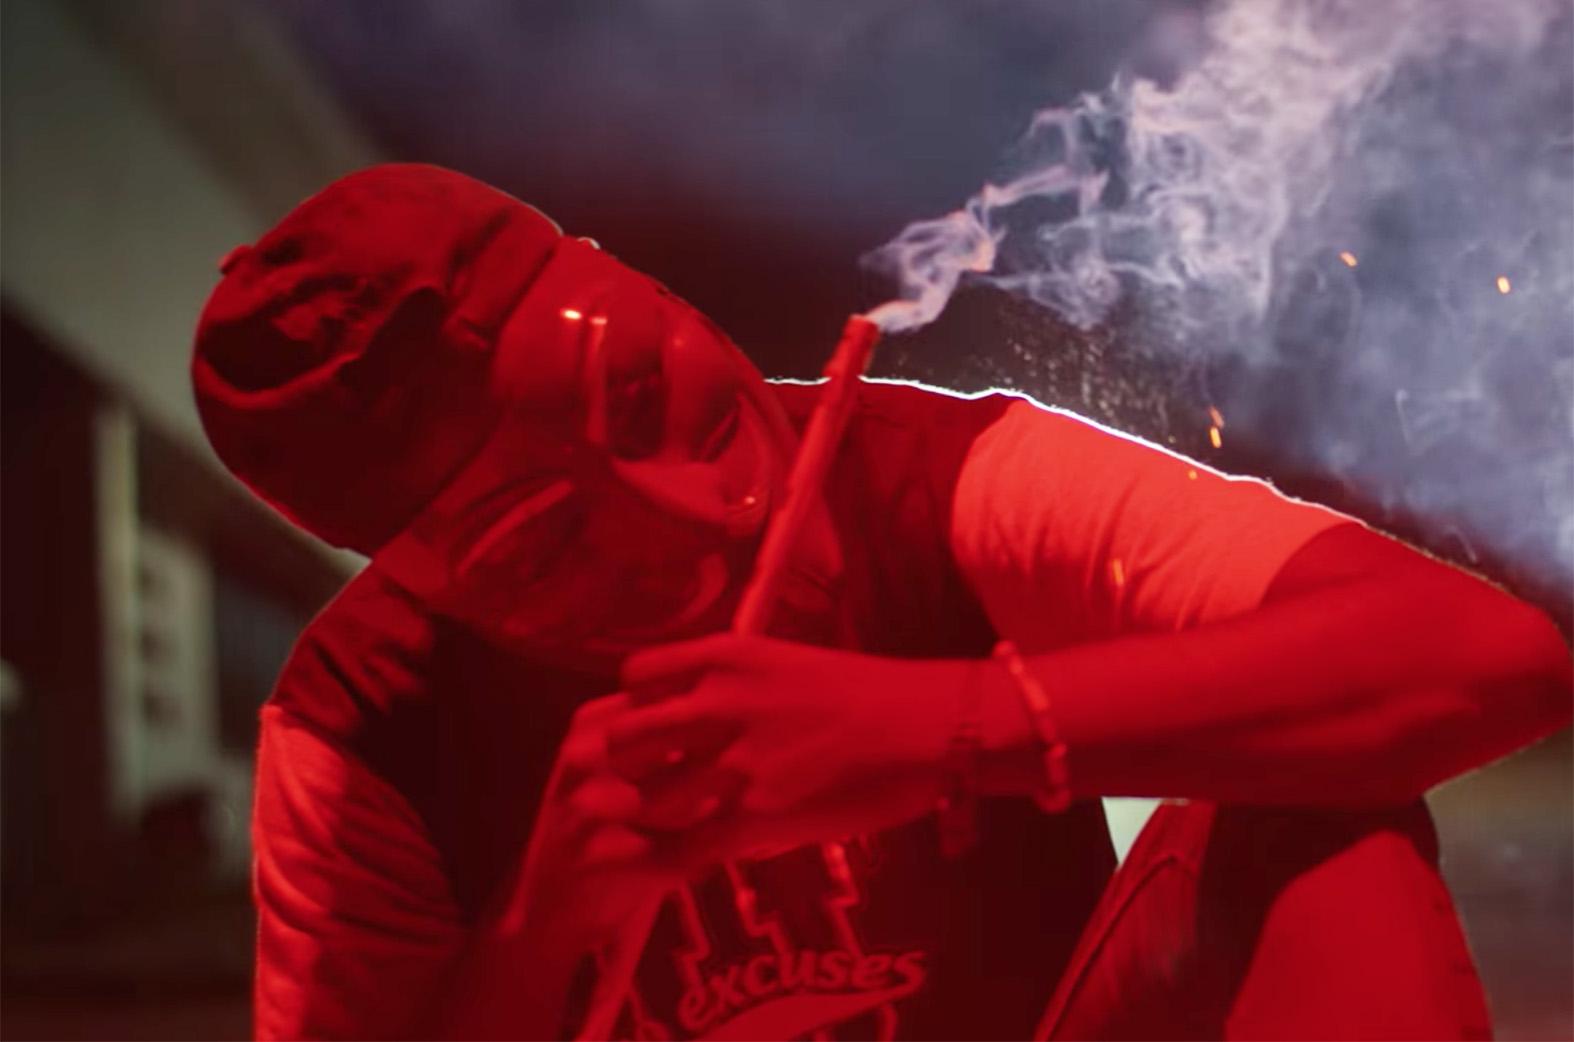 Video: Katiboom by Kwaw Kese feat. Medikal, Pappy Kojo & Ball J